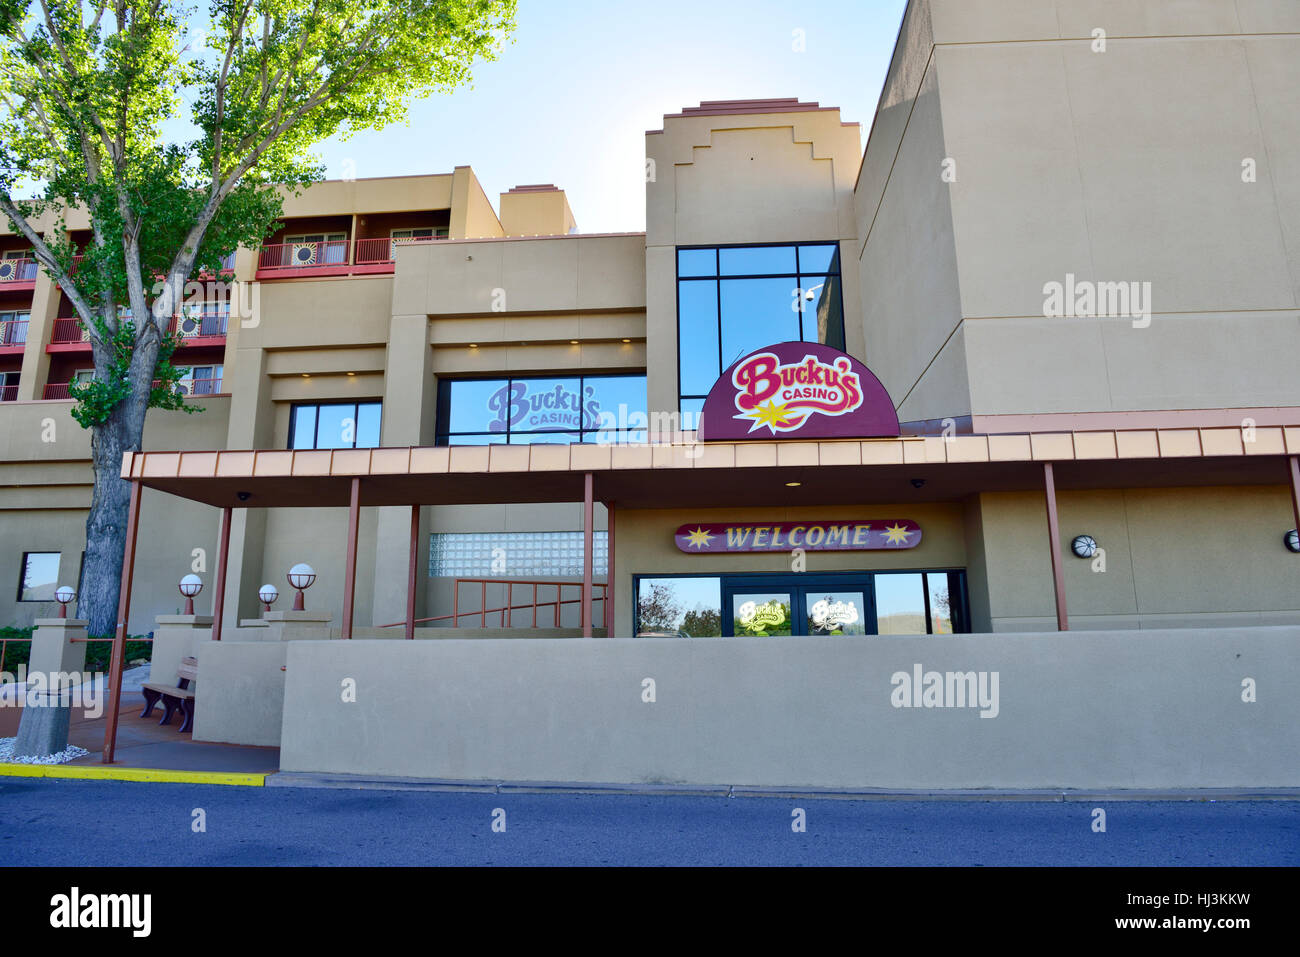 Bucky's Casino, Prescott, Arizona on Native American Indian reservation part of Prescott Resort & Conference - Stock Image